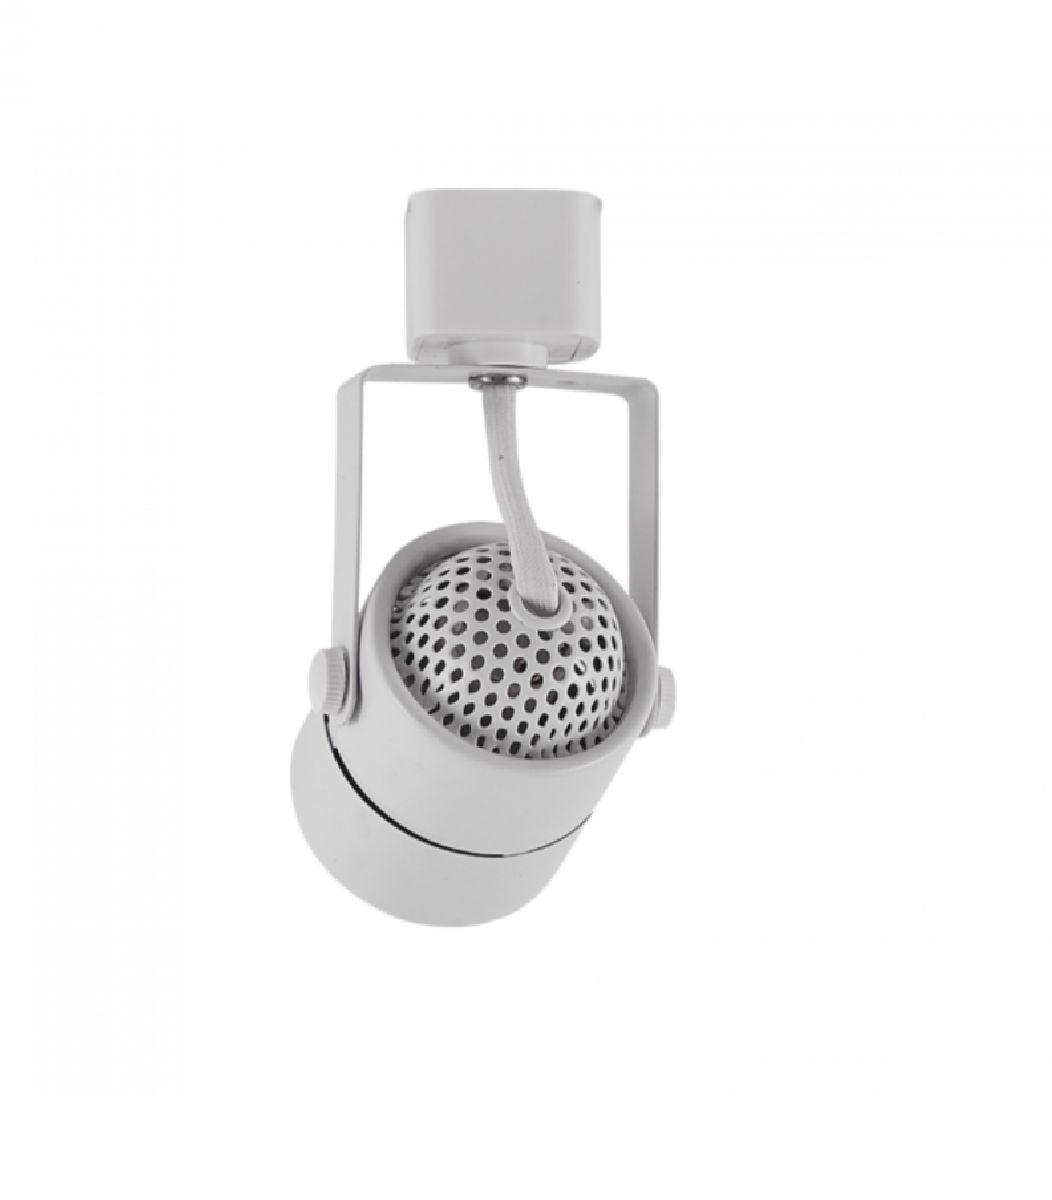 Kit Trilho Eletrificado 1,5m Branco Nordecor + 4 Spot Redondo MR16 / GU10